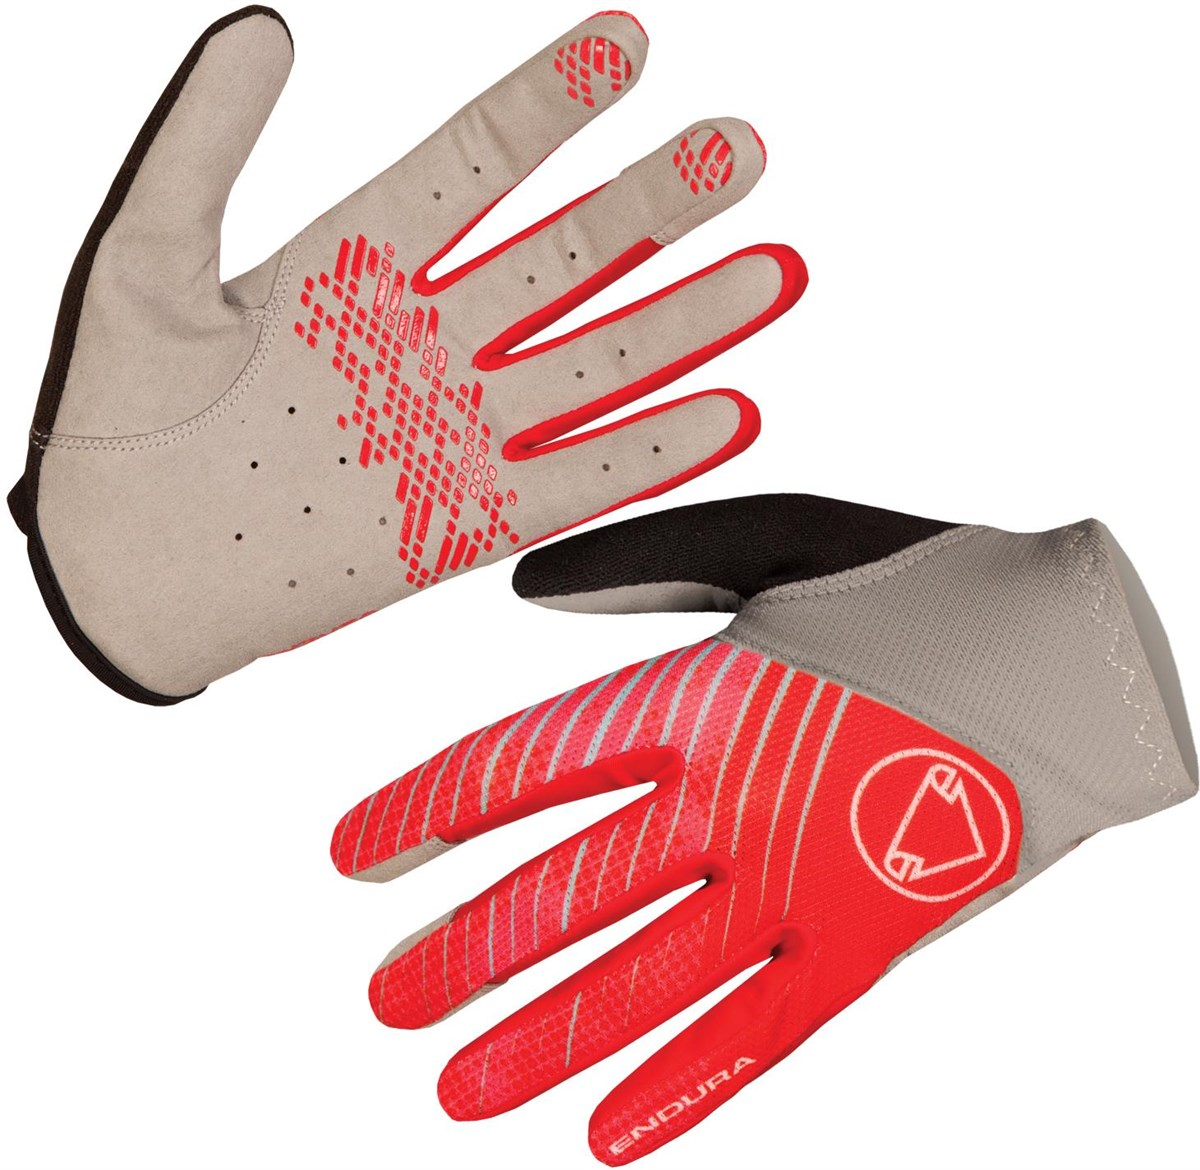 Endura Hummvee Lite Glove - red | Gloves